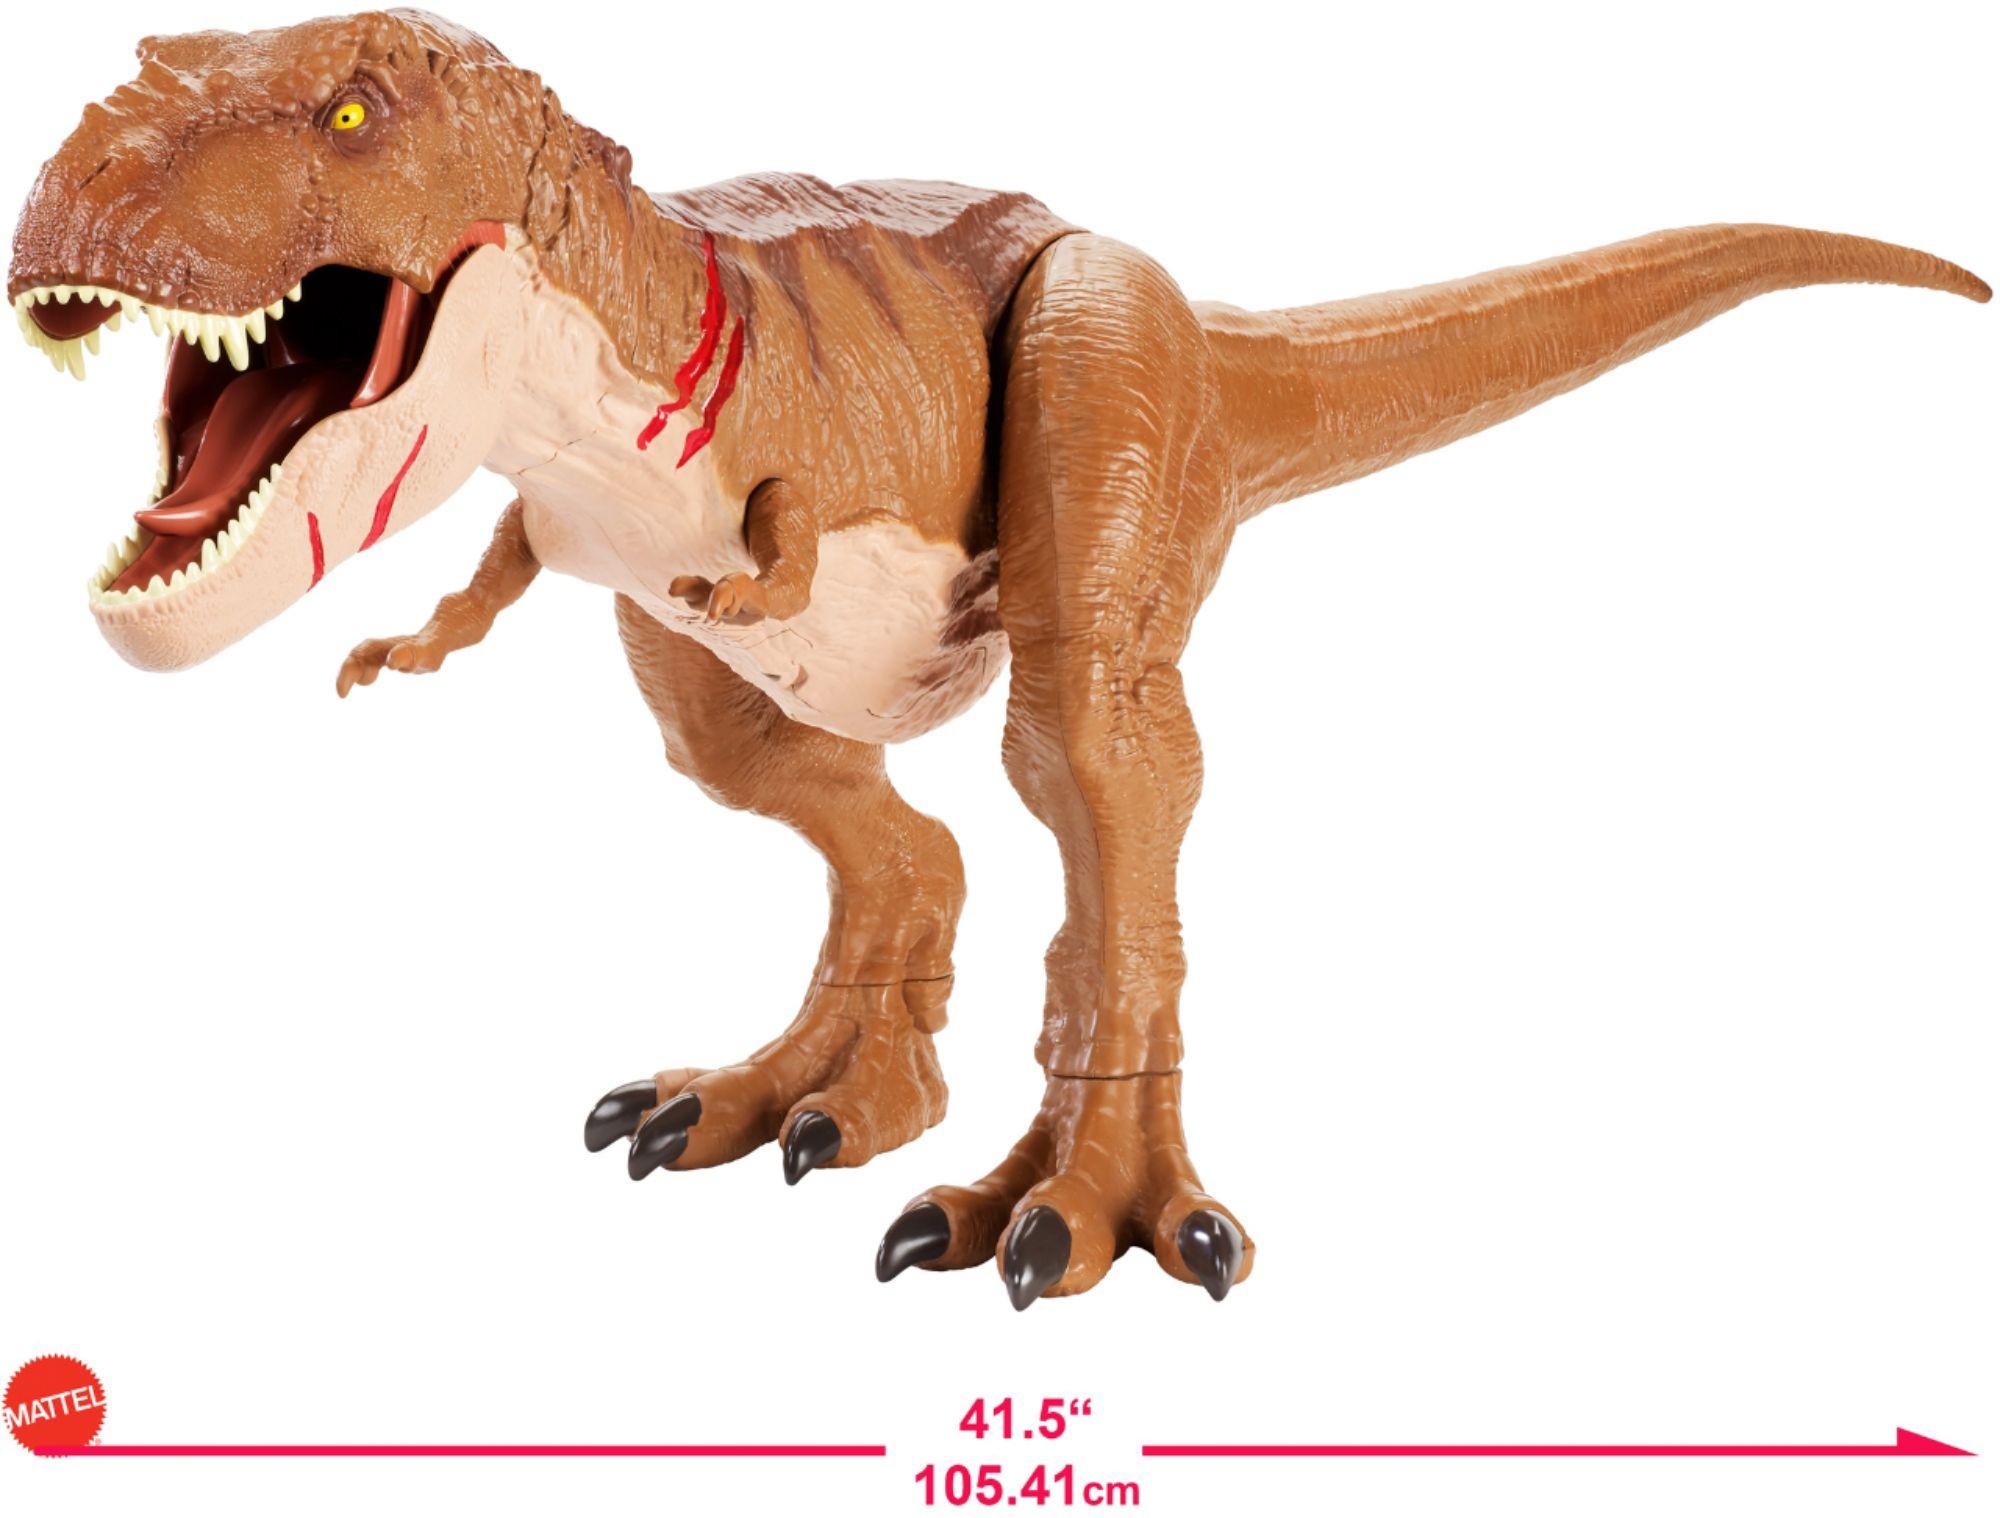 Jurassic World Battle Damage Roarin' Super Colossal Tyrannosaurus Rex $29.99 @ BB